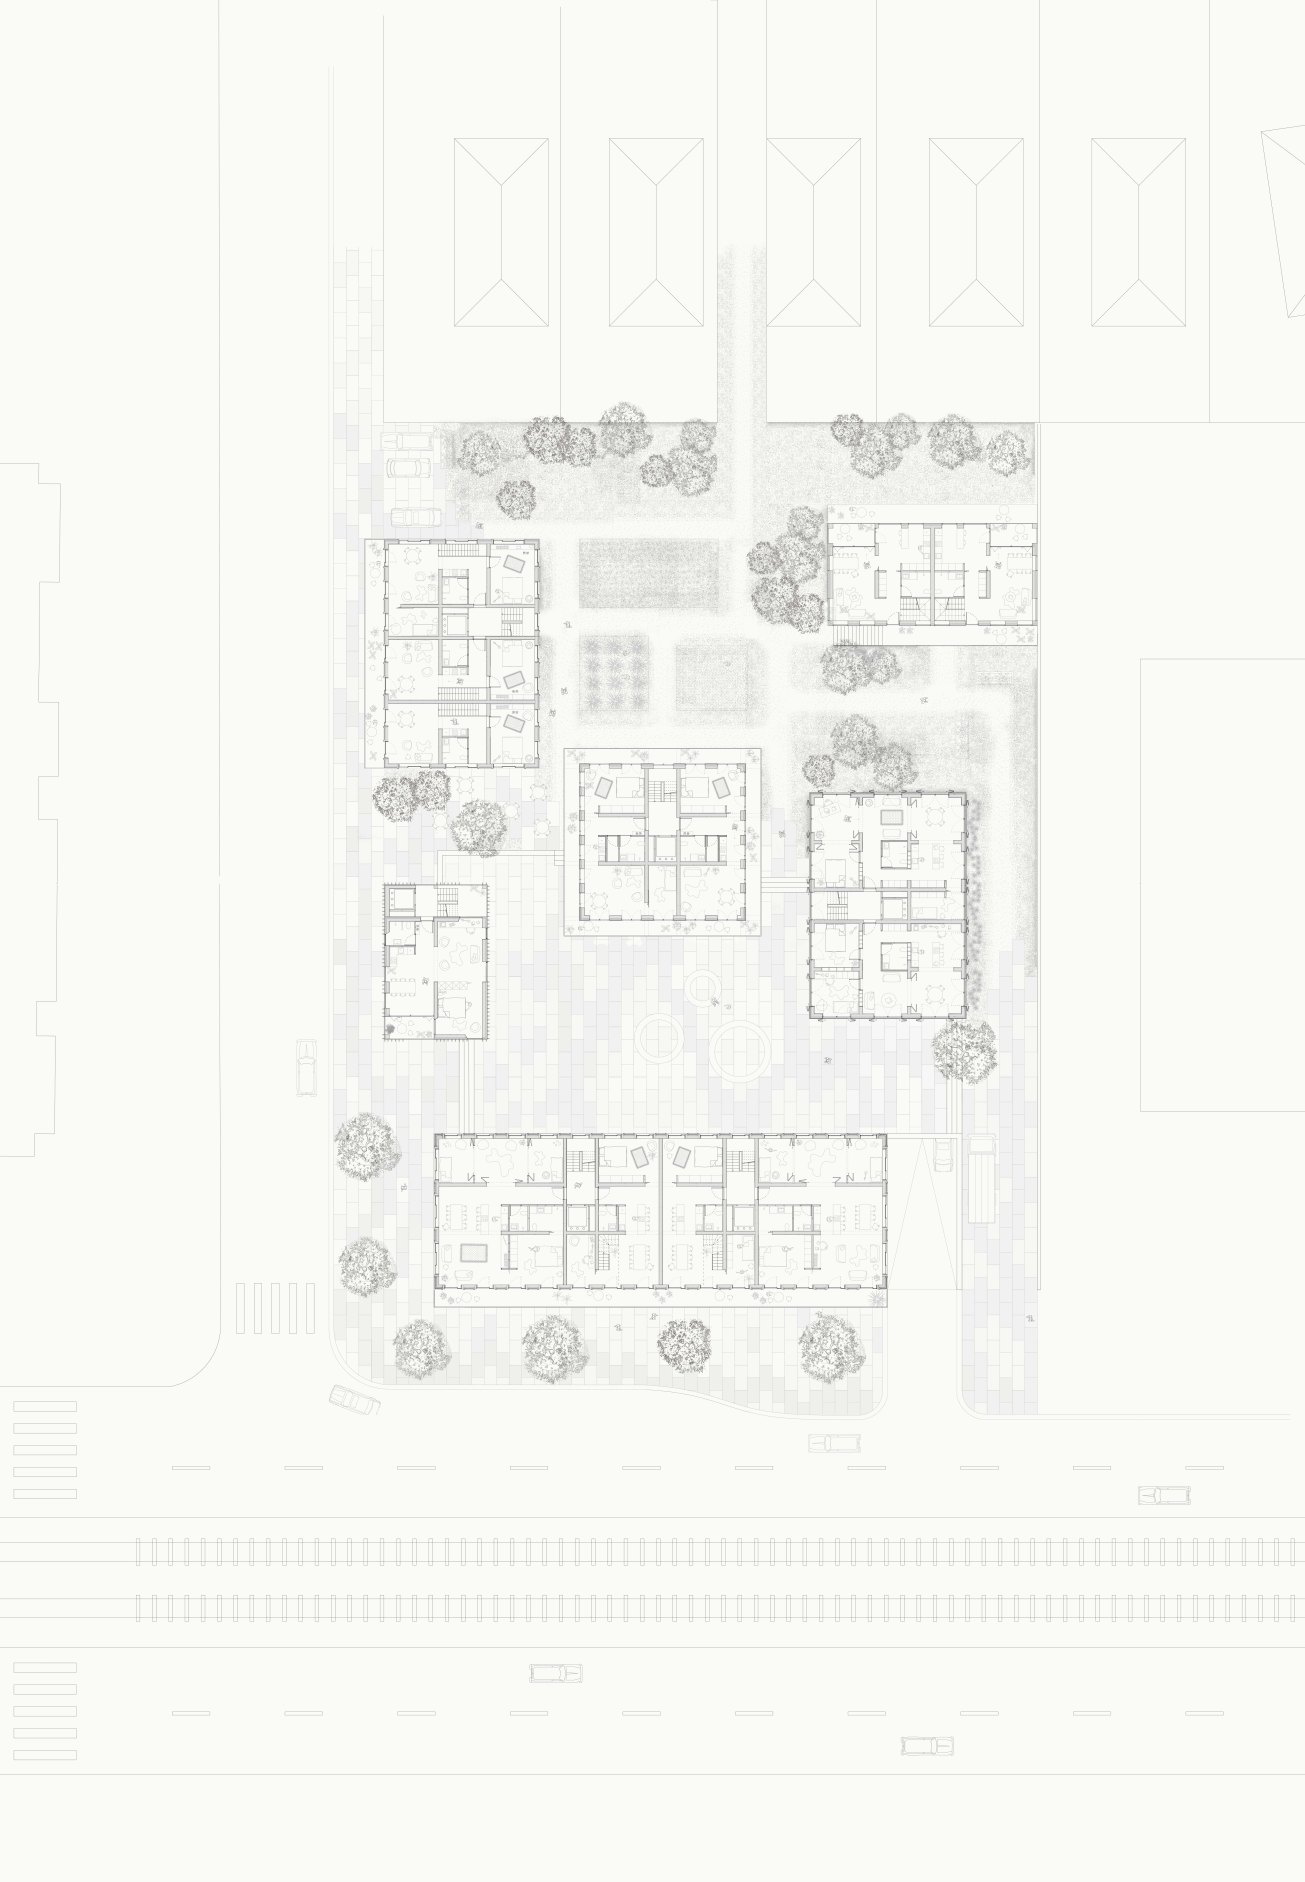 /Users/nikvandewyngaerde/Desktop/TORONTO/06 Plannen/plannen 11:5